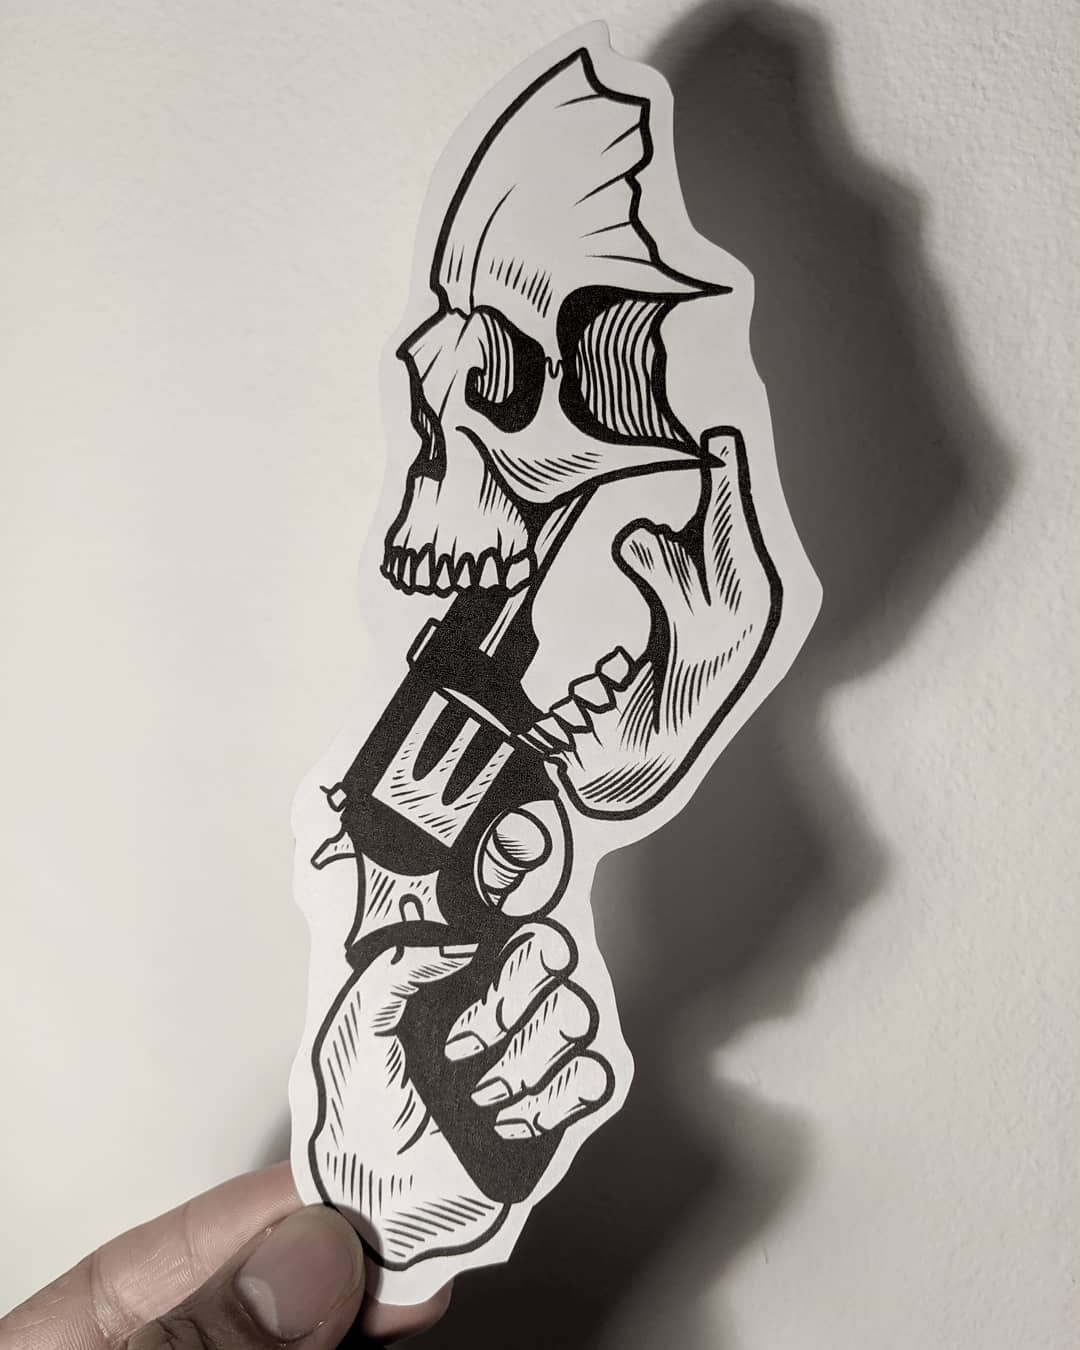 Kevin Keates On Instagram Oldie Wannado Illustration Doodle Darkarts Lowbrow Lowbrowwolf Sleeve Tattoos Tattoo Sketches Tattoo Design Drawings